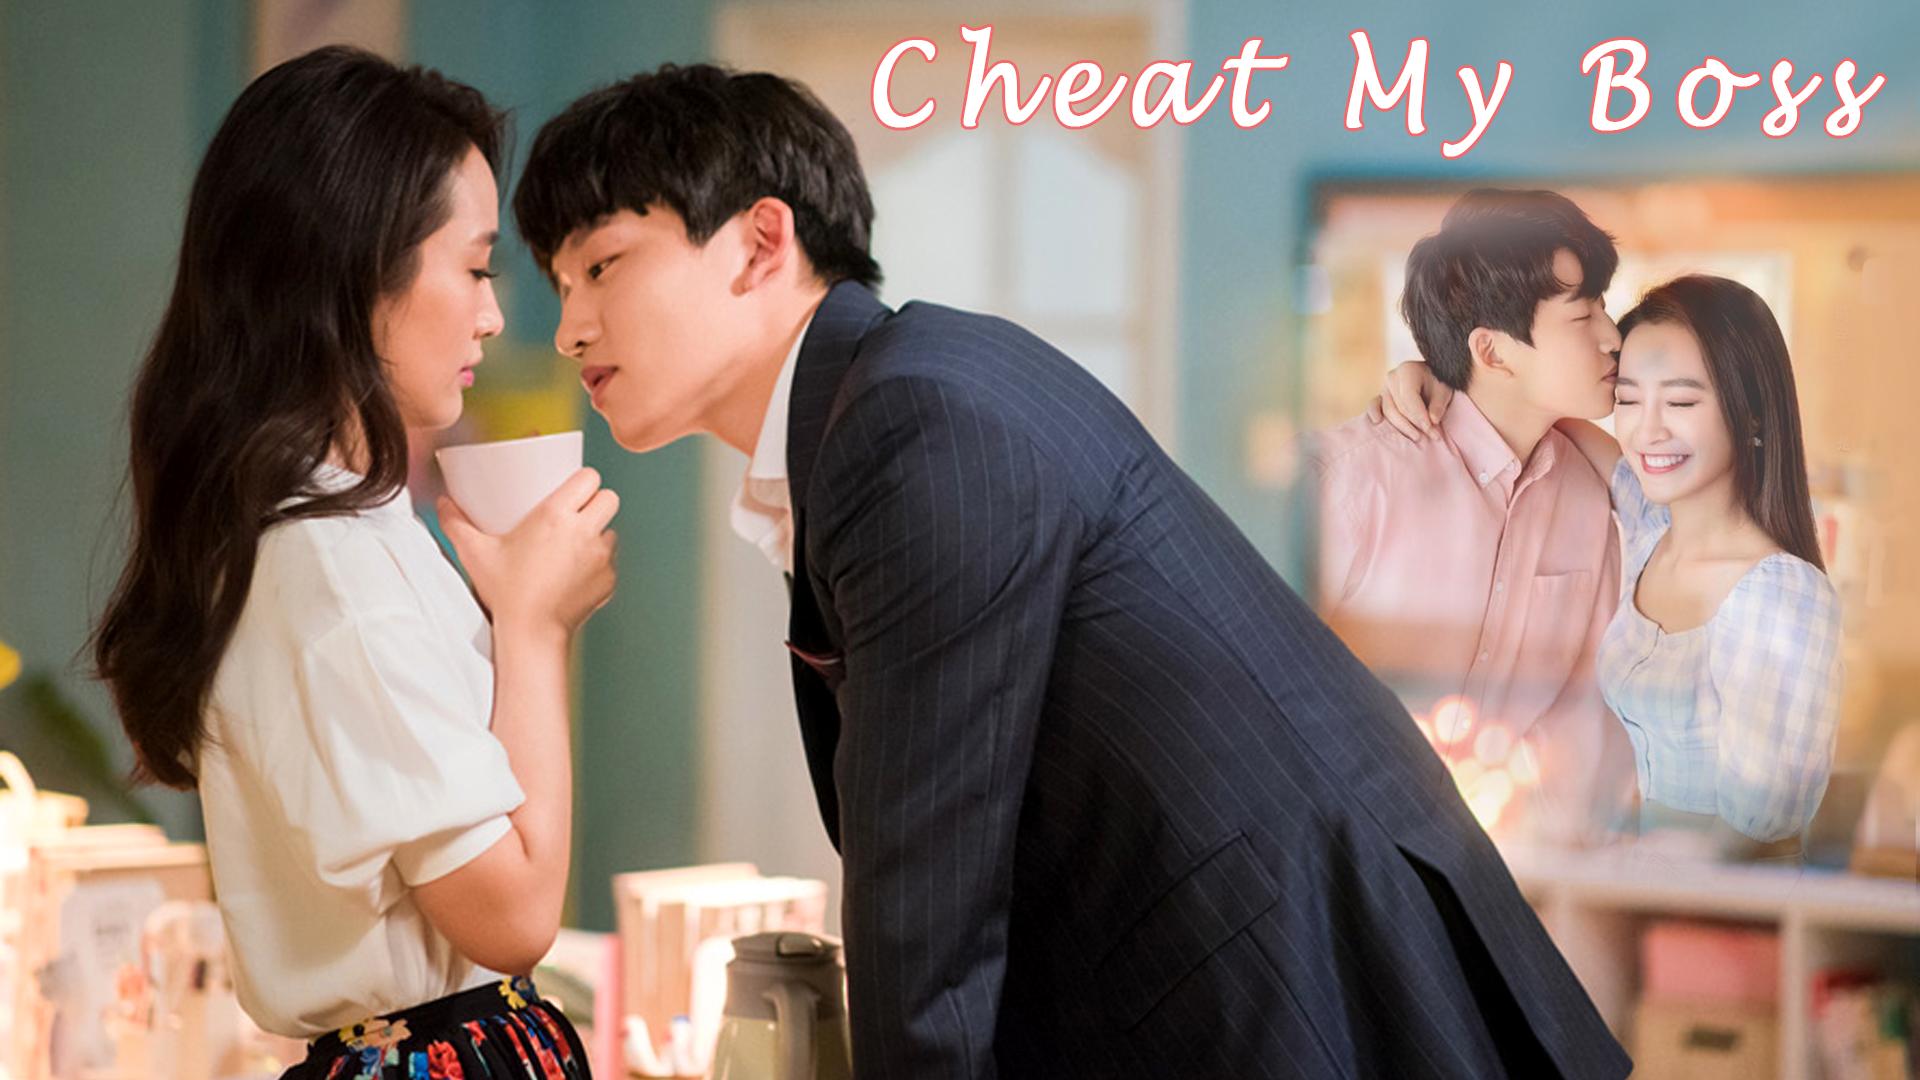 Cheat My Boss